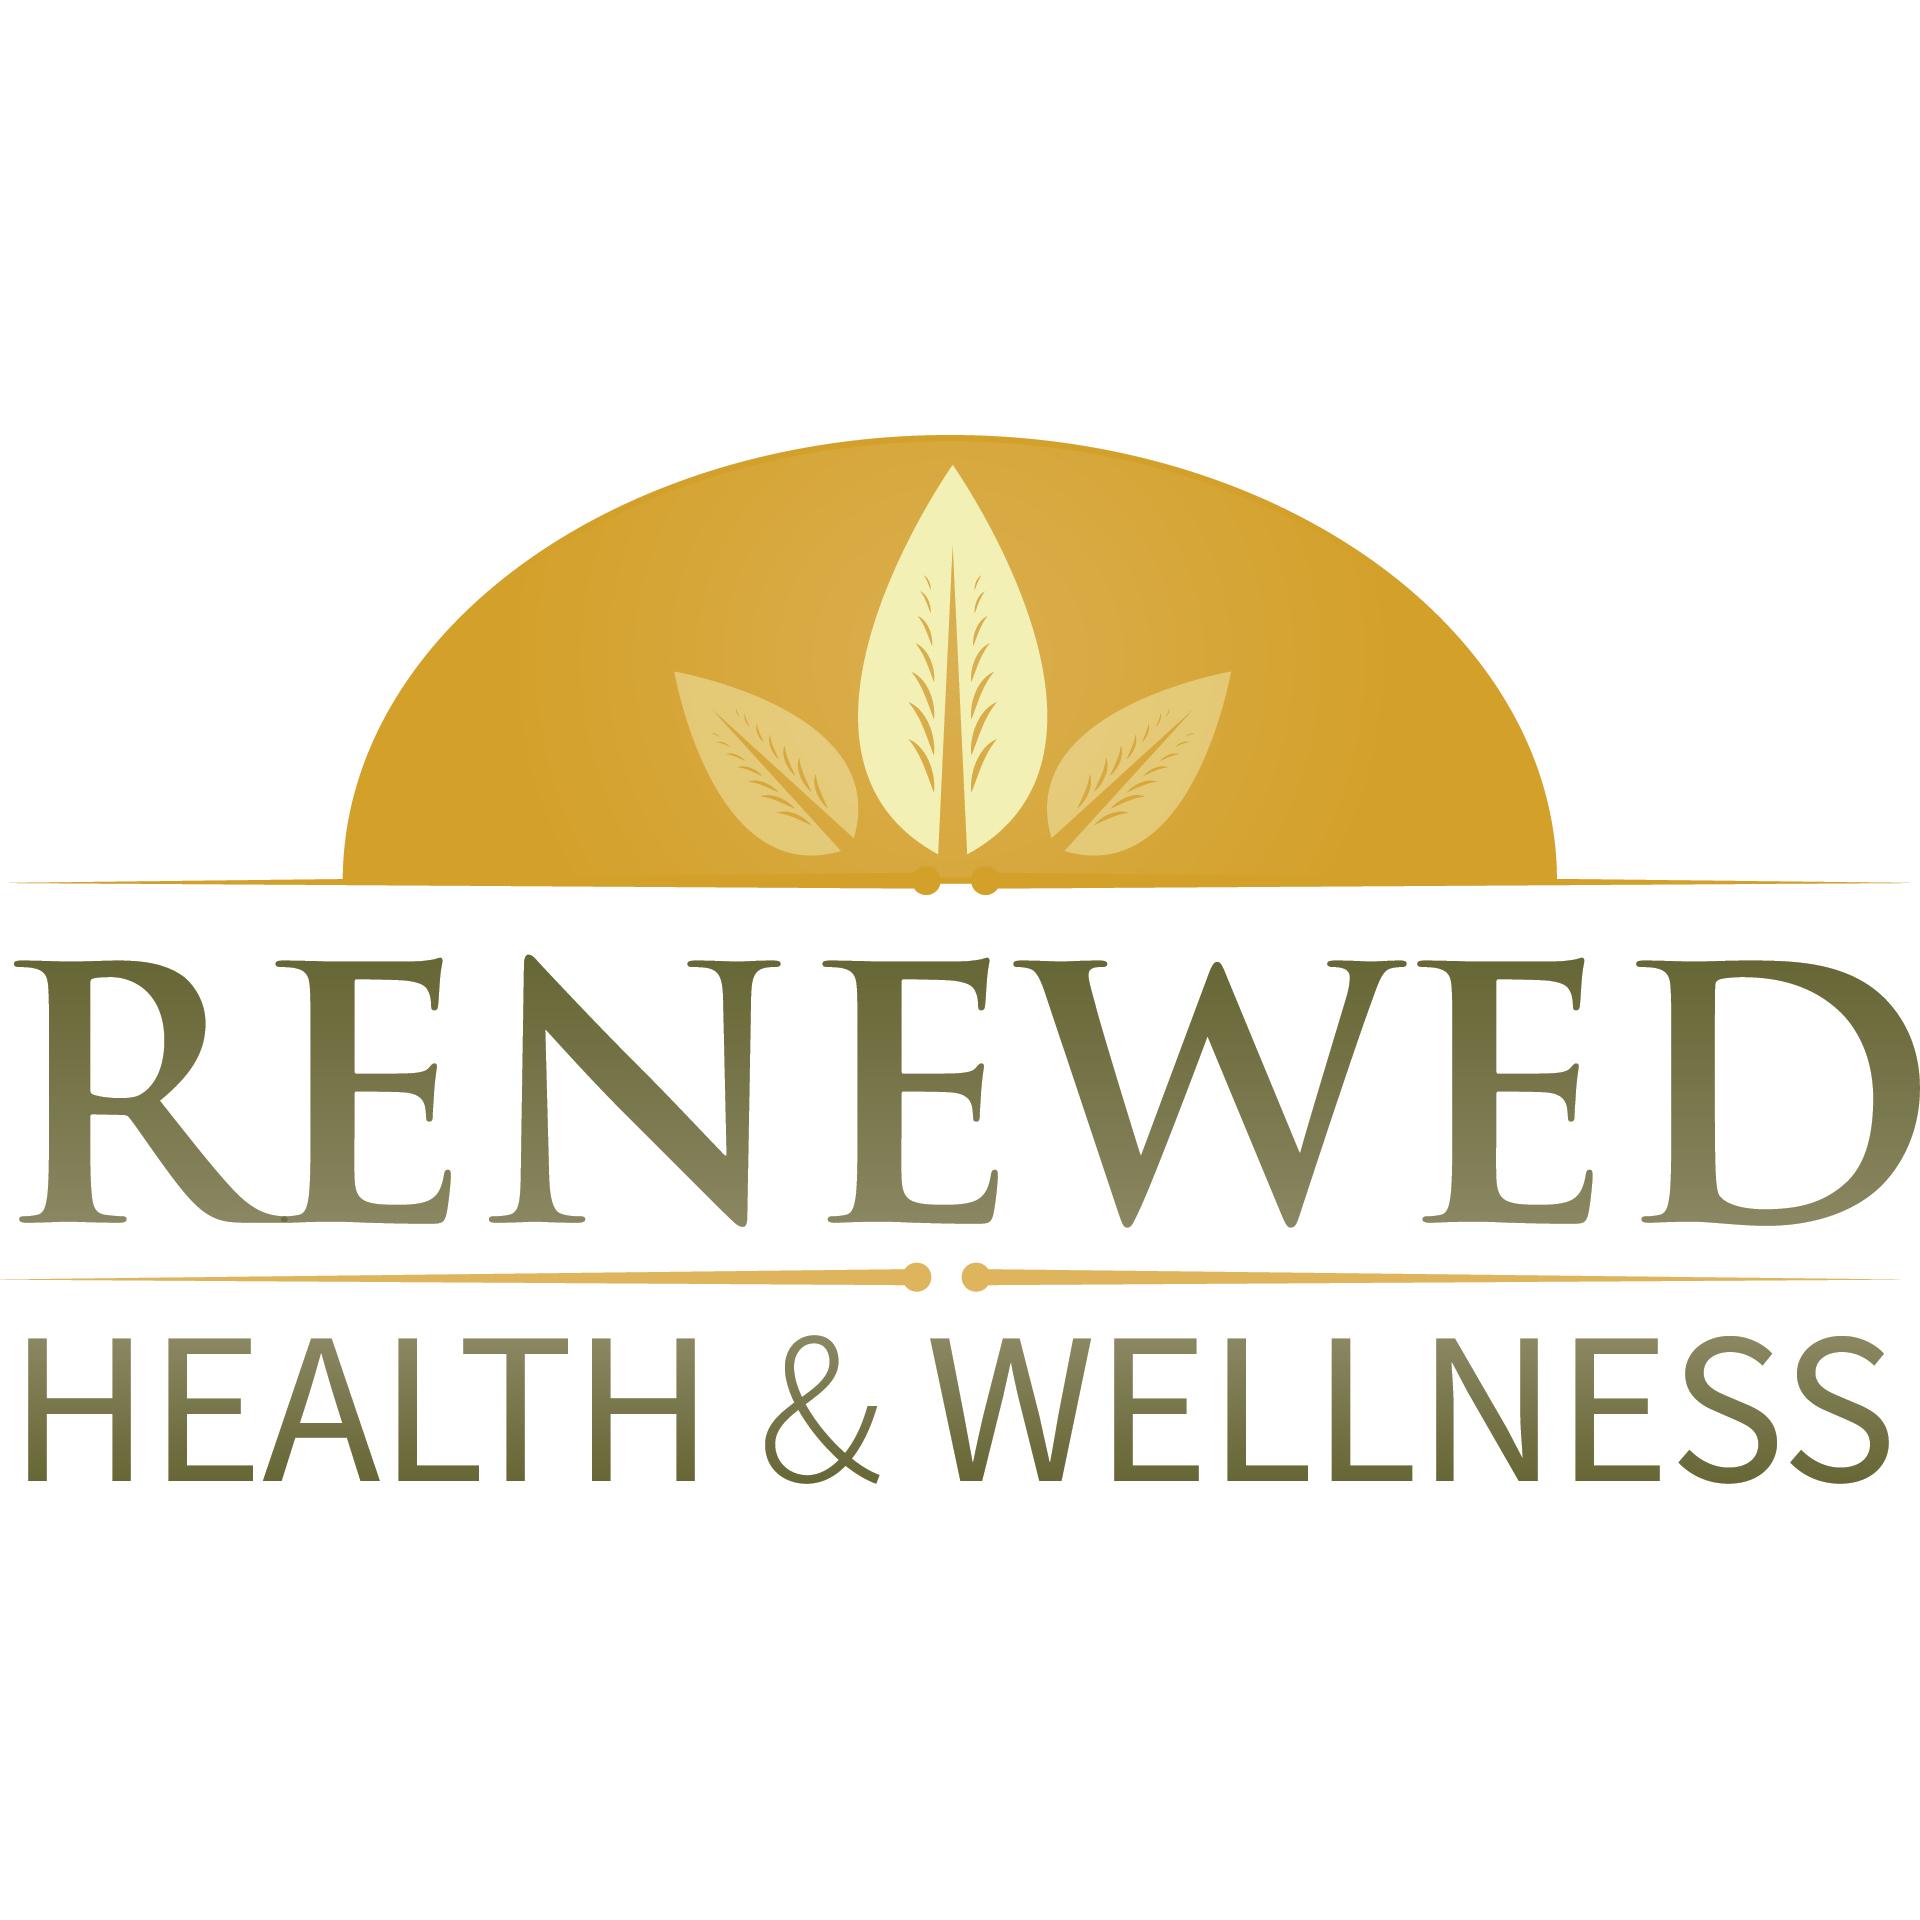 Renewed Health & Wellness